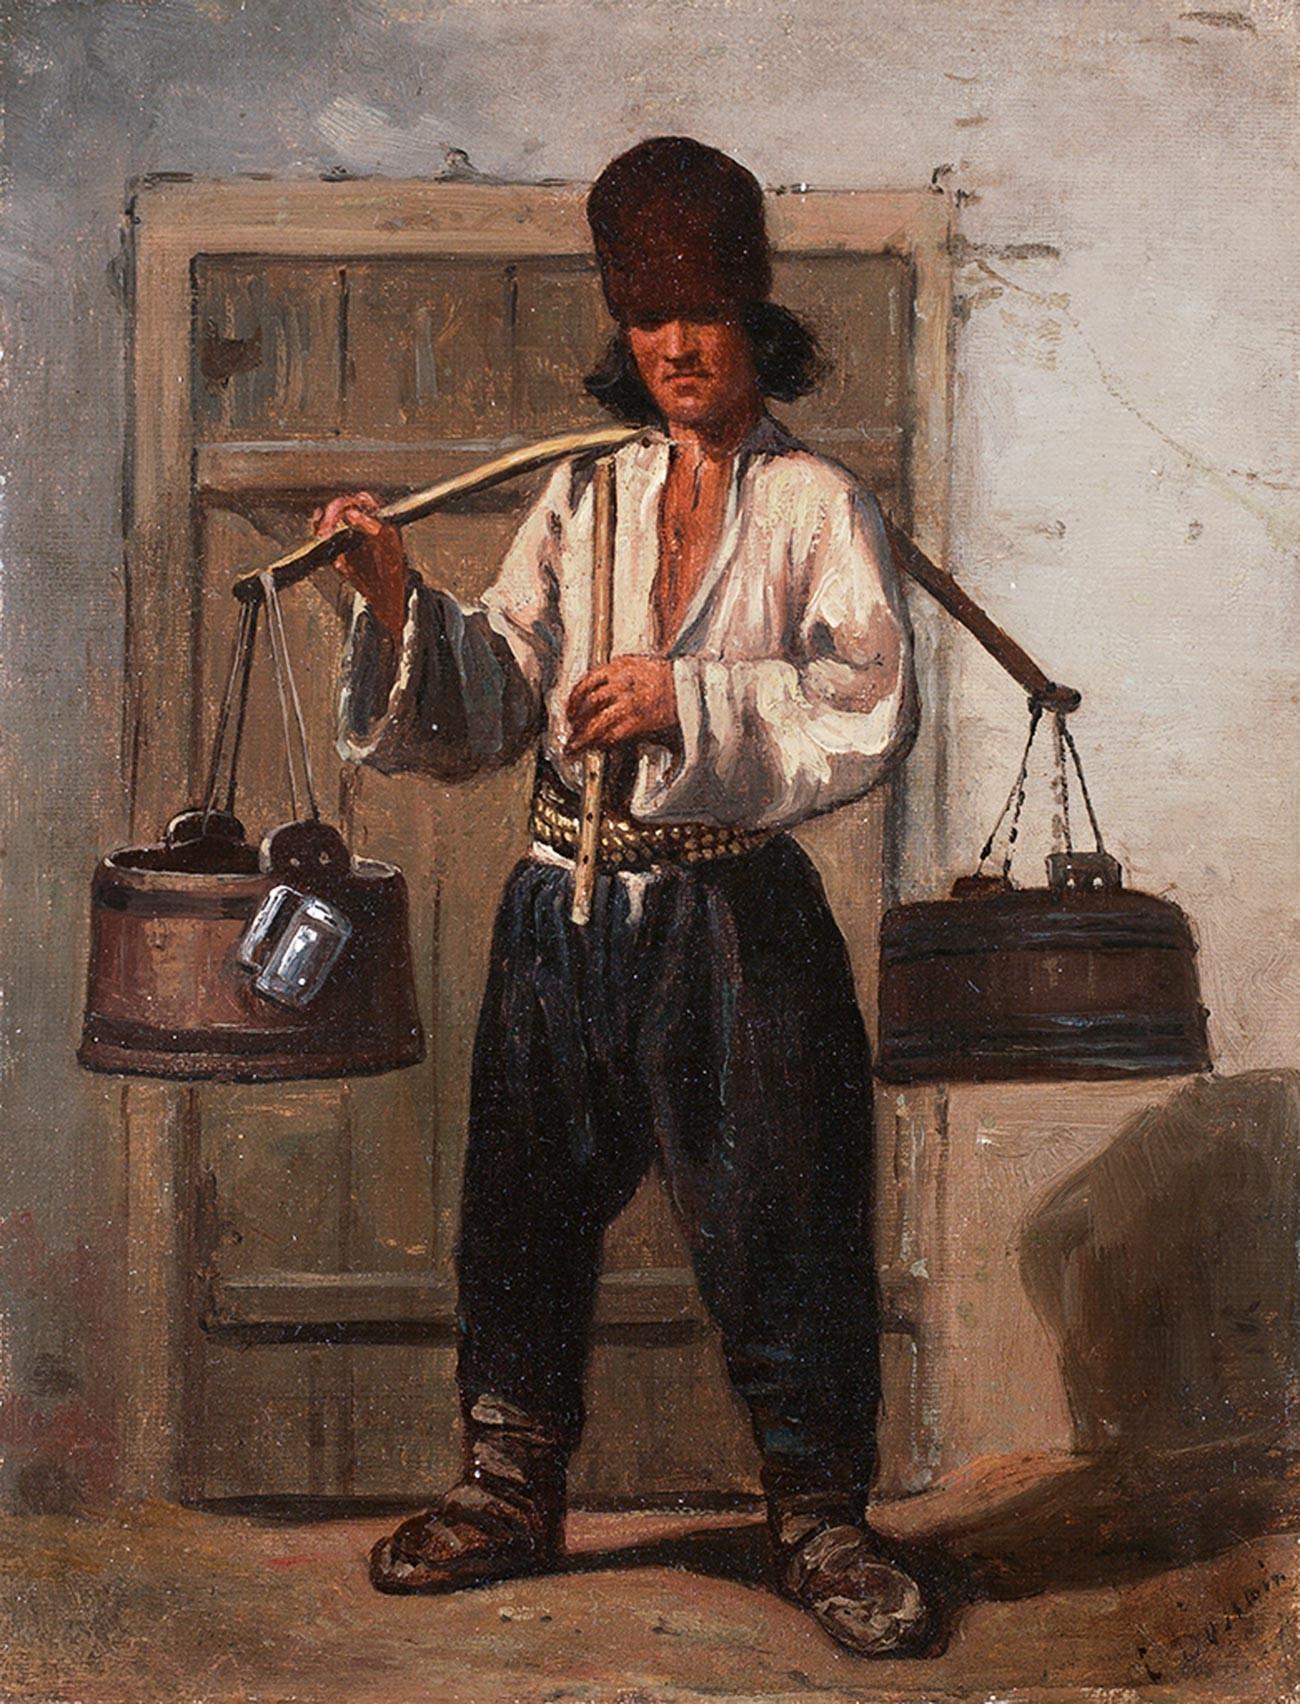 Ruski trgovec s kvasom